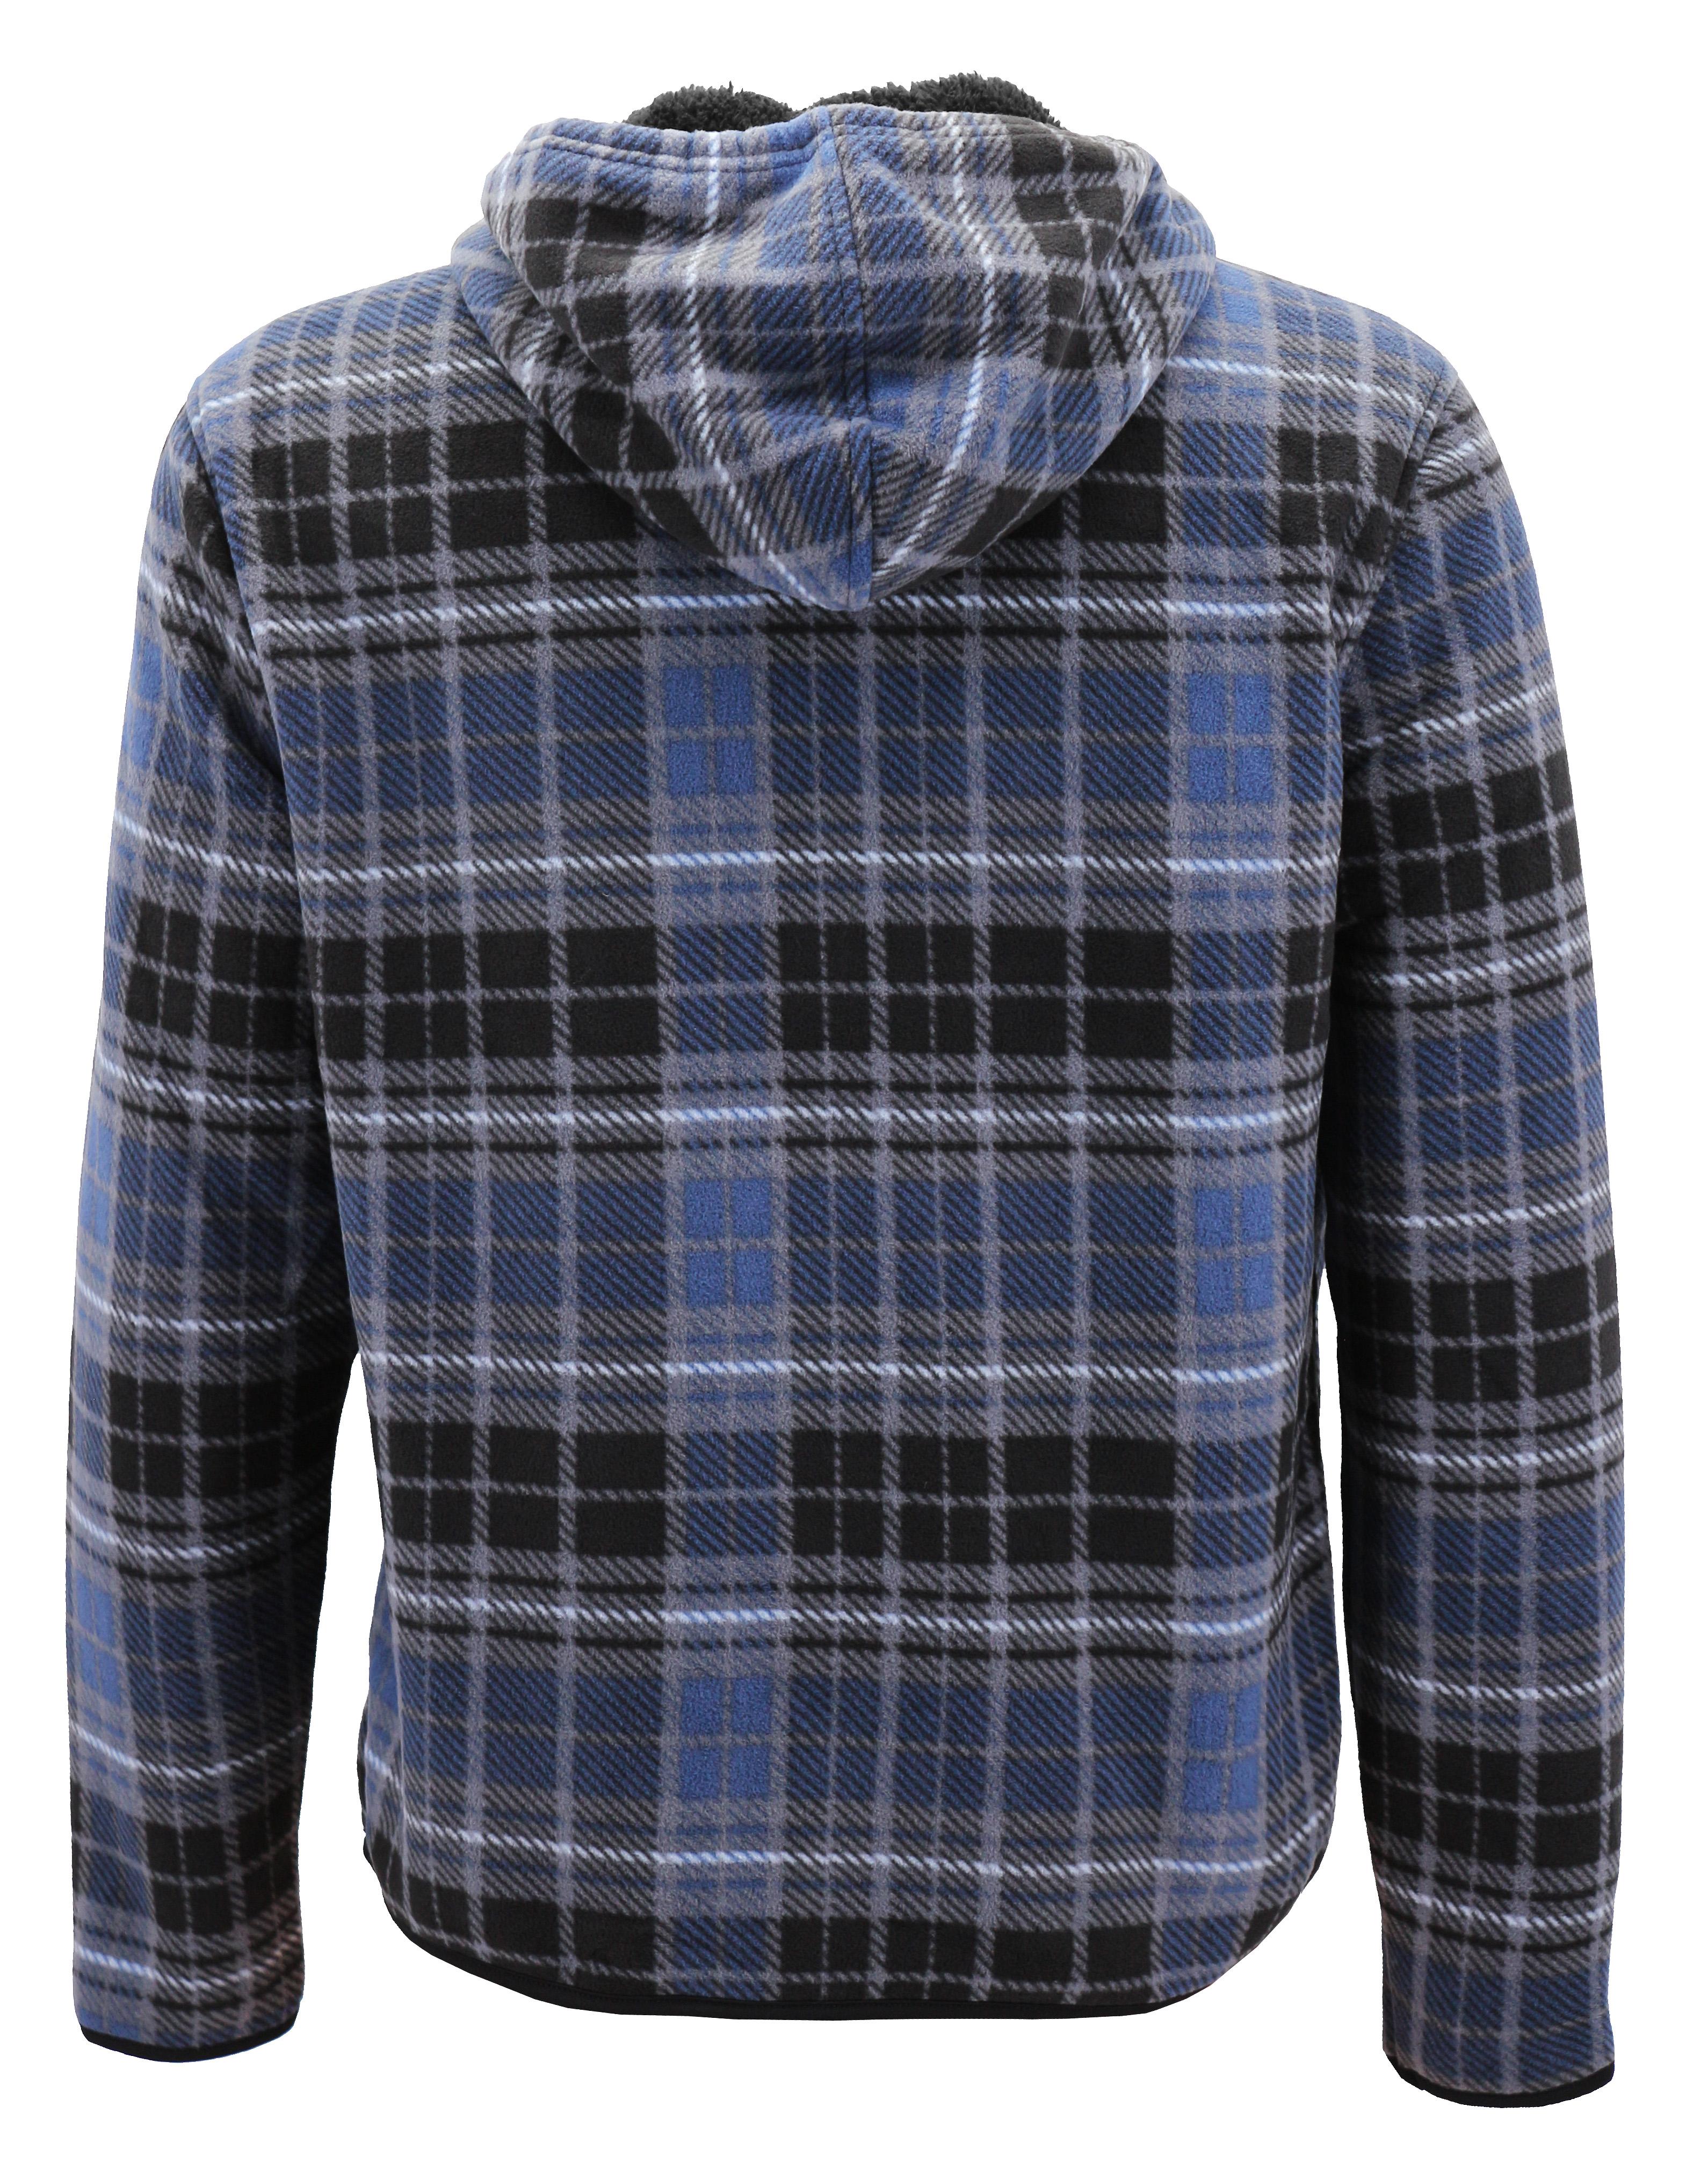 Men-039-s-Casual-Flannel-Zip-Up-Fleece-Lined-Plaid-Sherpa-Hoodie-Lightweight-Jacket thumbnail 9